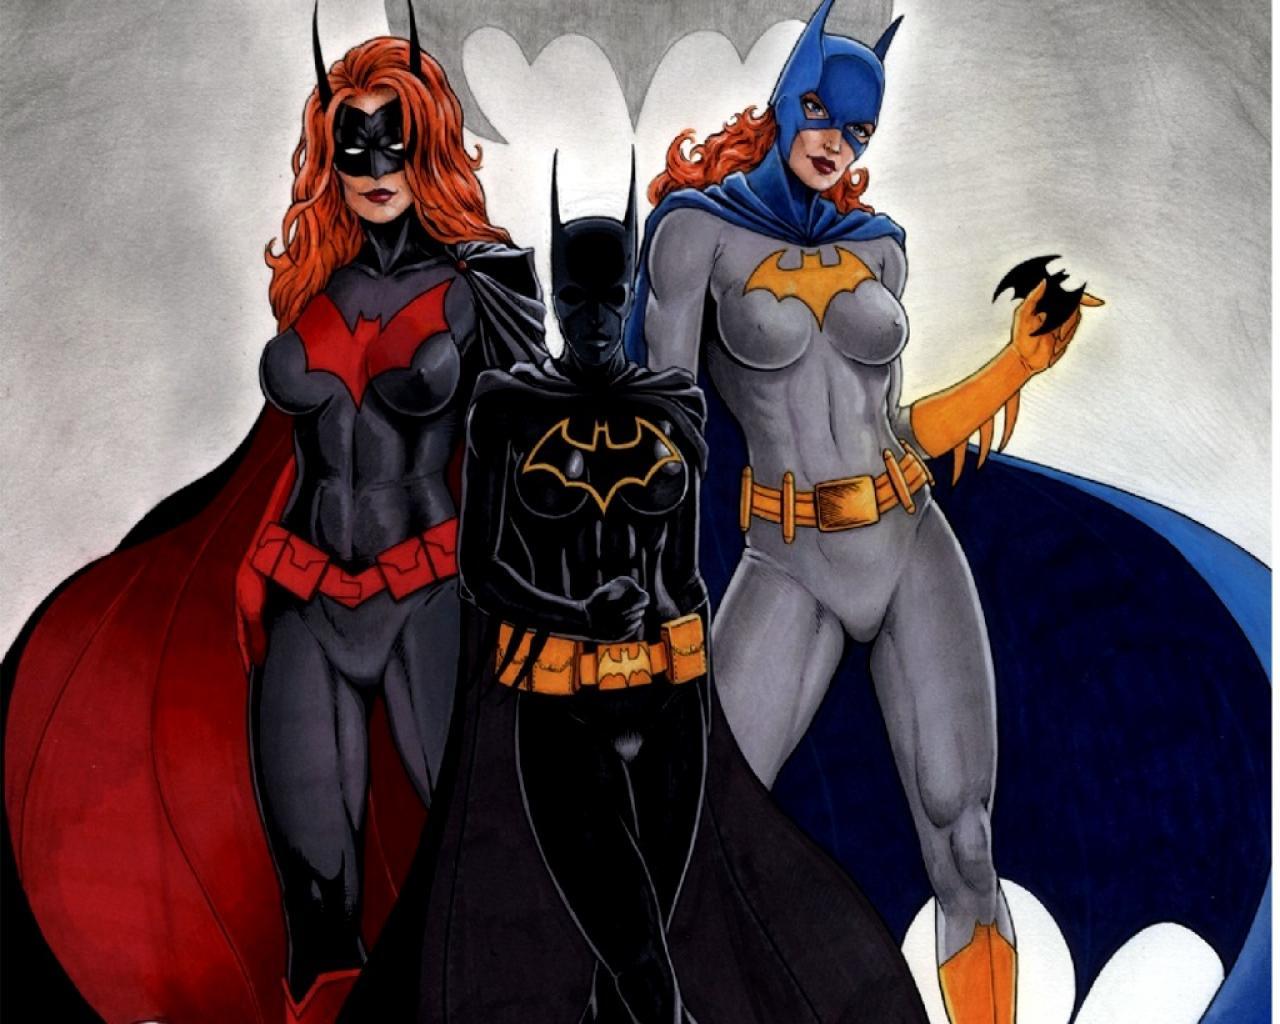 dc comics batgirl batwoman barbara gordon HD Wallpaper of Cartoon 1280x1024